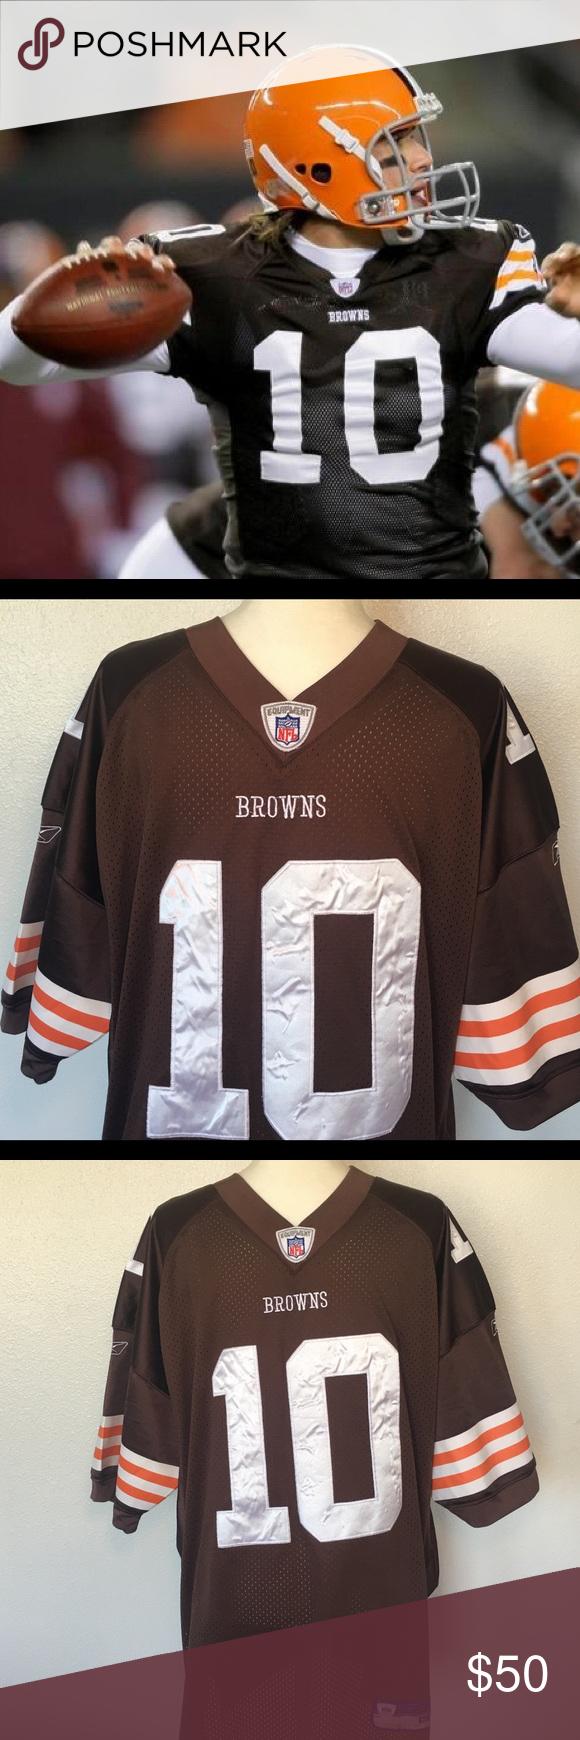 new arrive 06502 0980e BRADY QUINN #10 Onfield Authentic NFL Jersey Reebok NFL ...